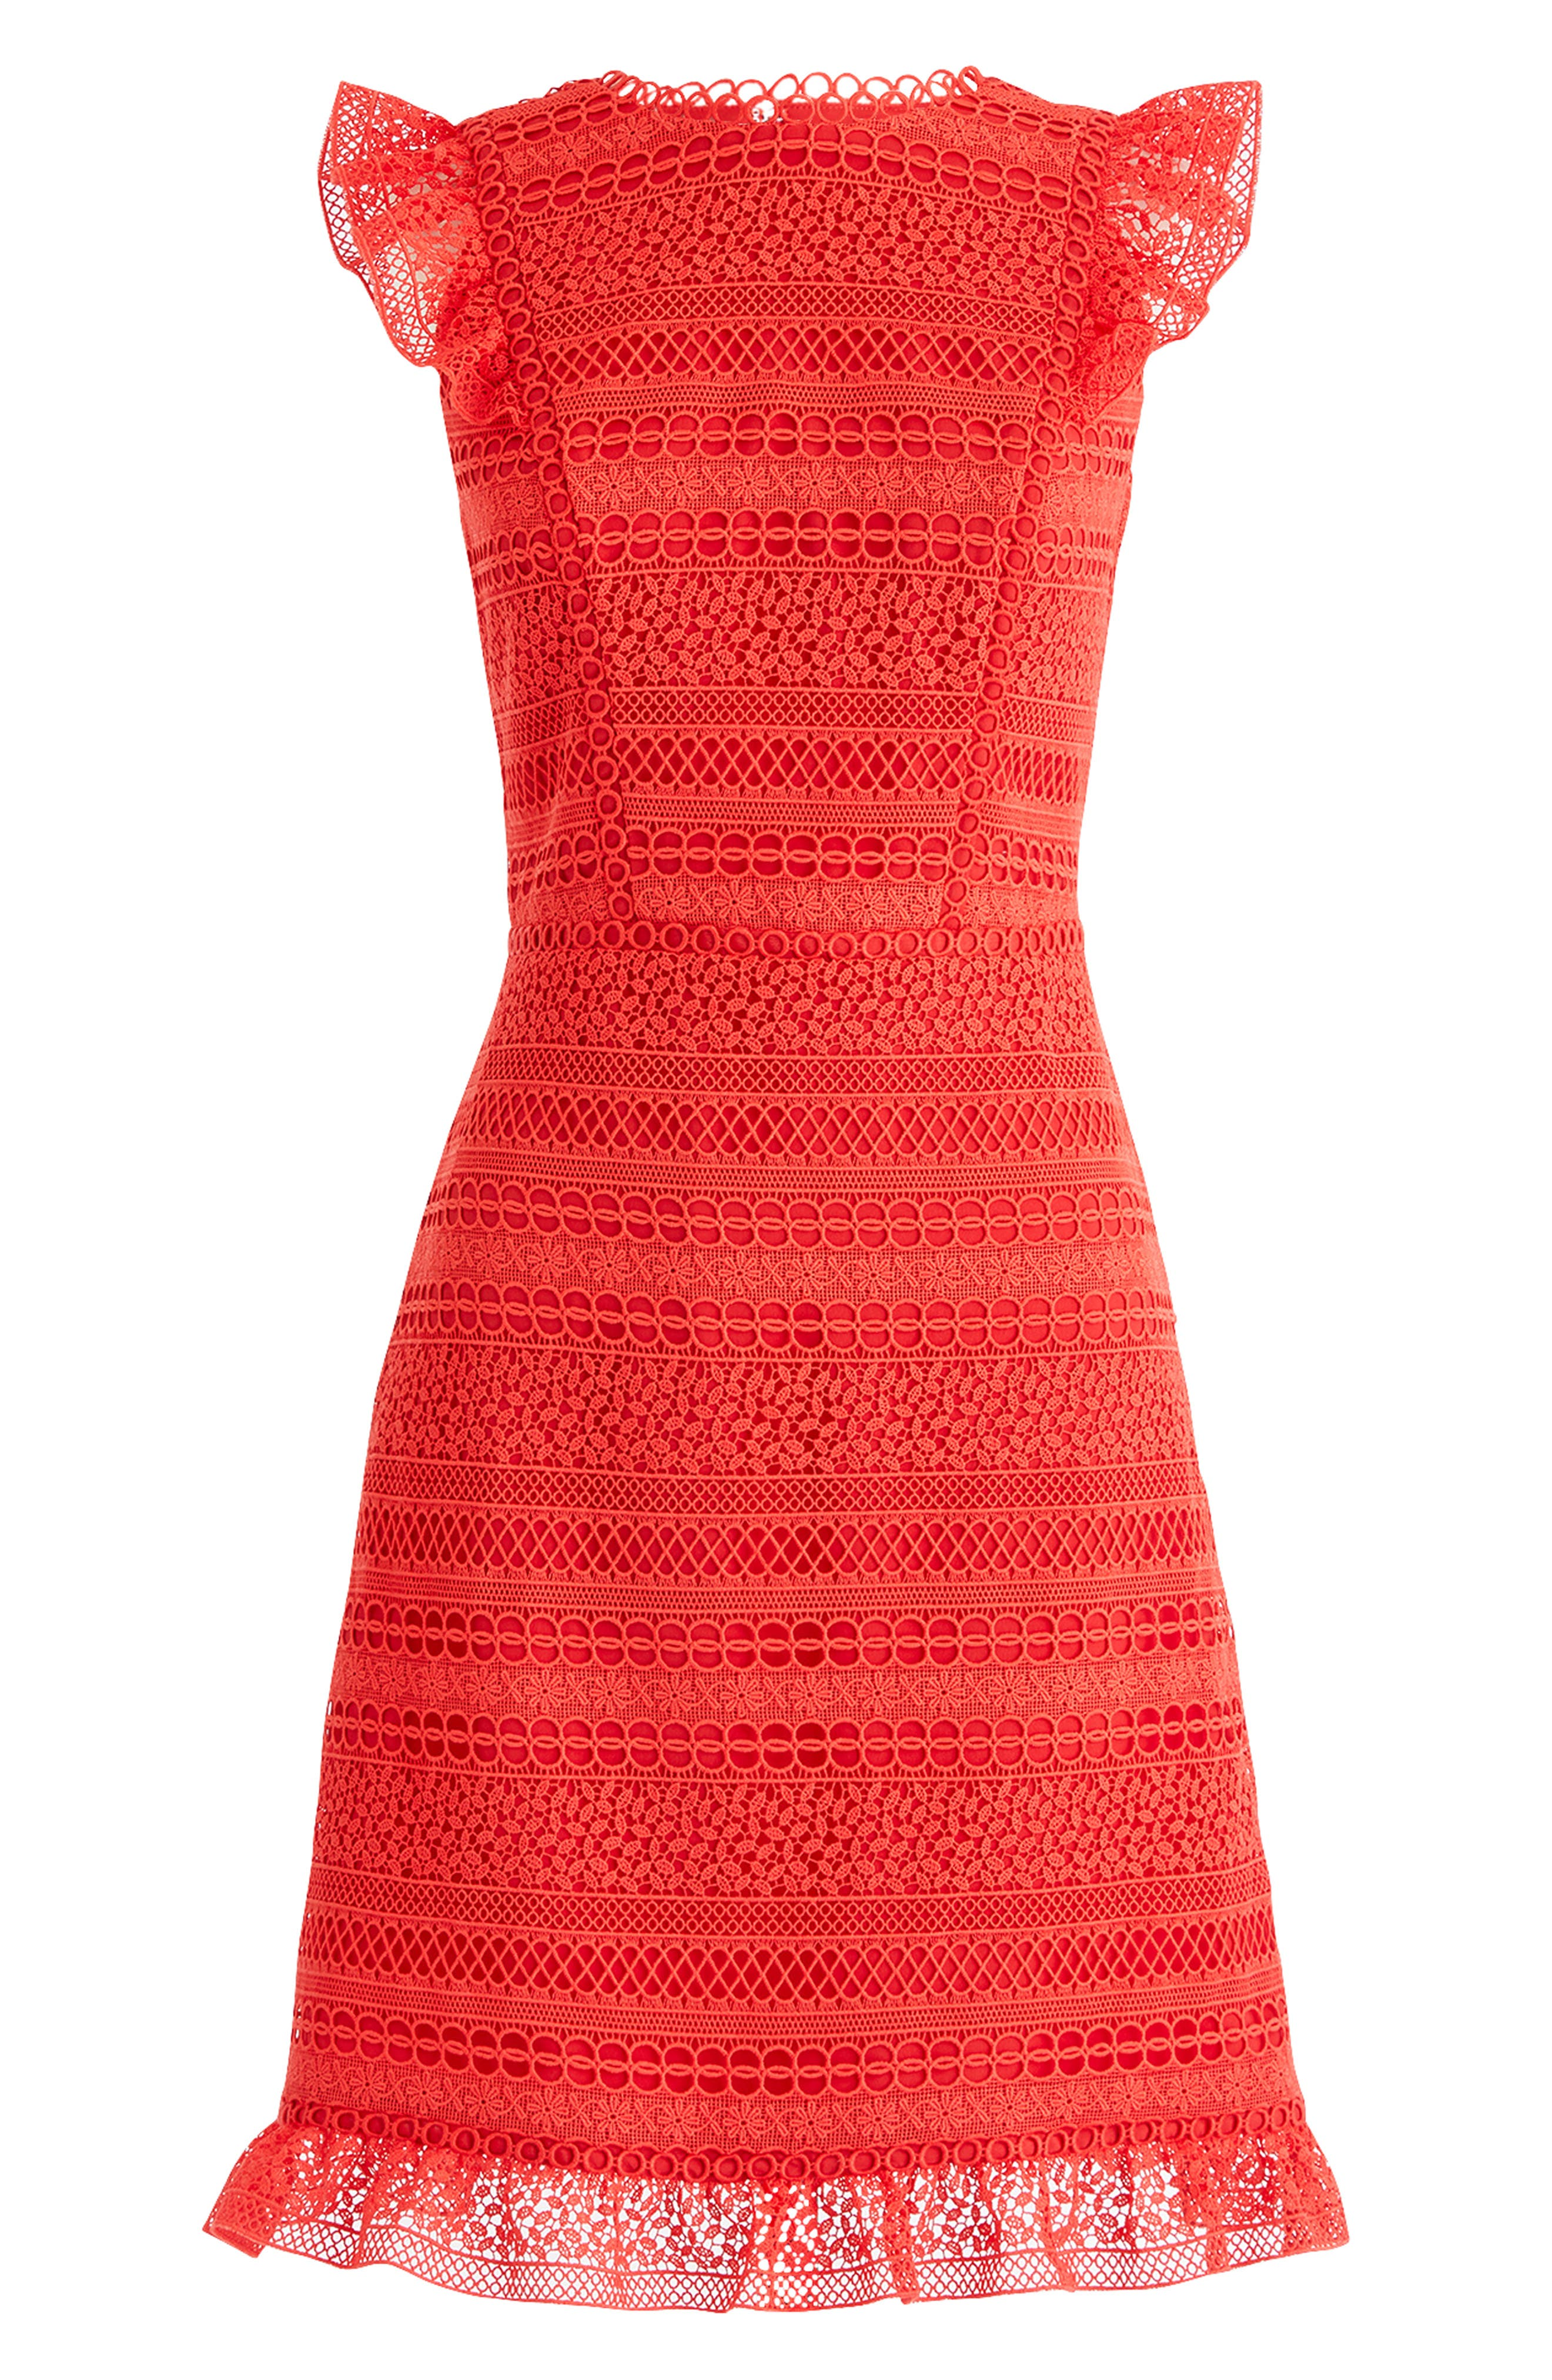 Cap Sleeve Ruffle Lace Dress,                             Alternate thumbnail 6, color,                             BRIGHT CERISE